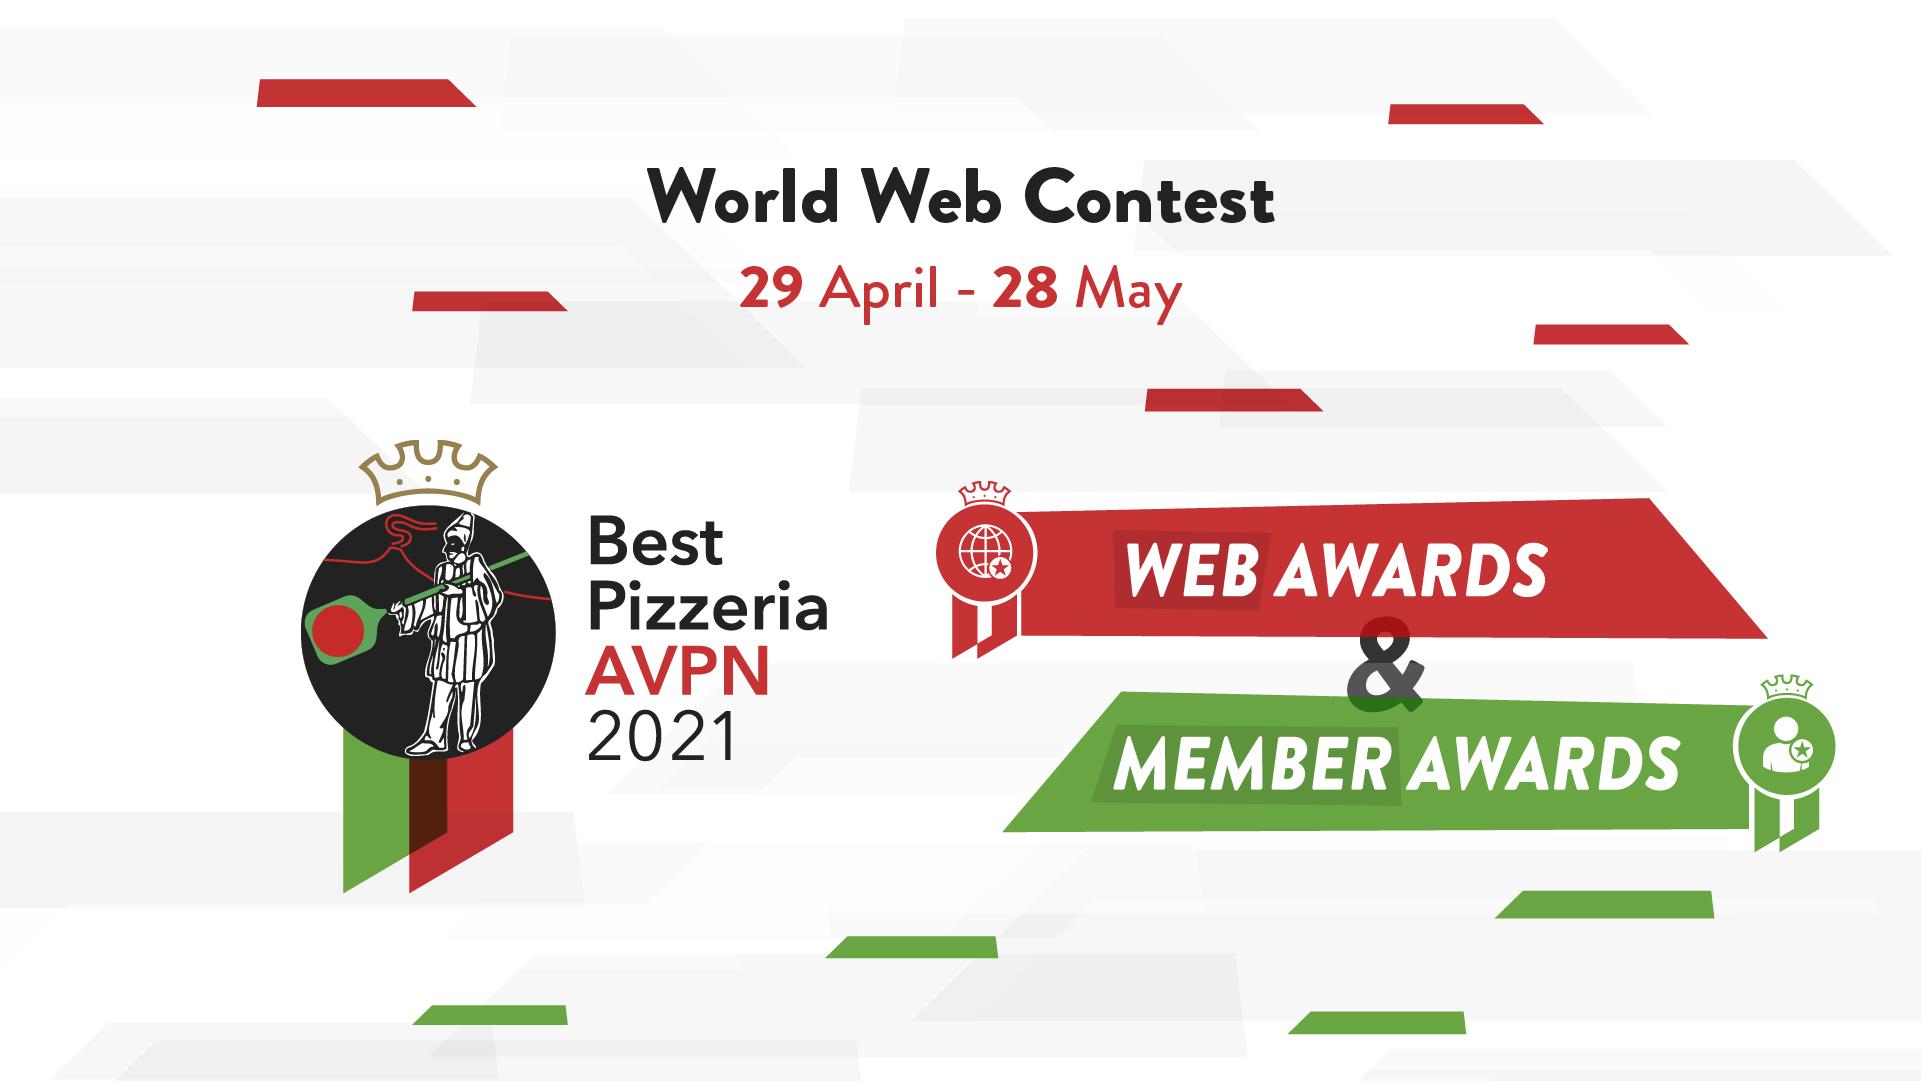 AVPN - Associazione Verace Pizza Napoletana